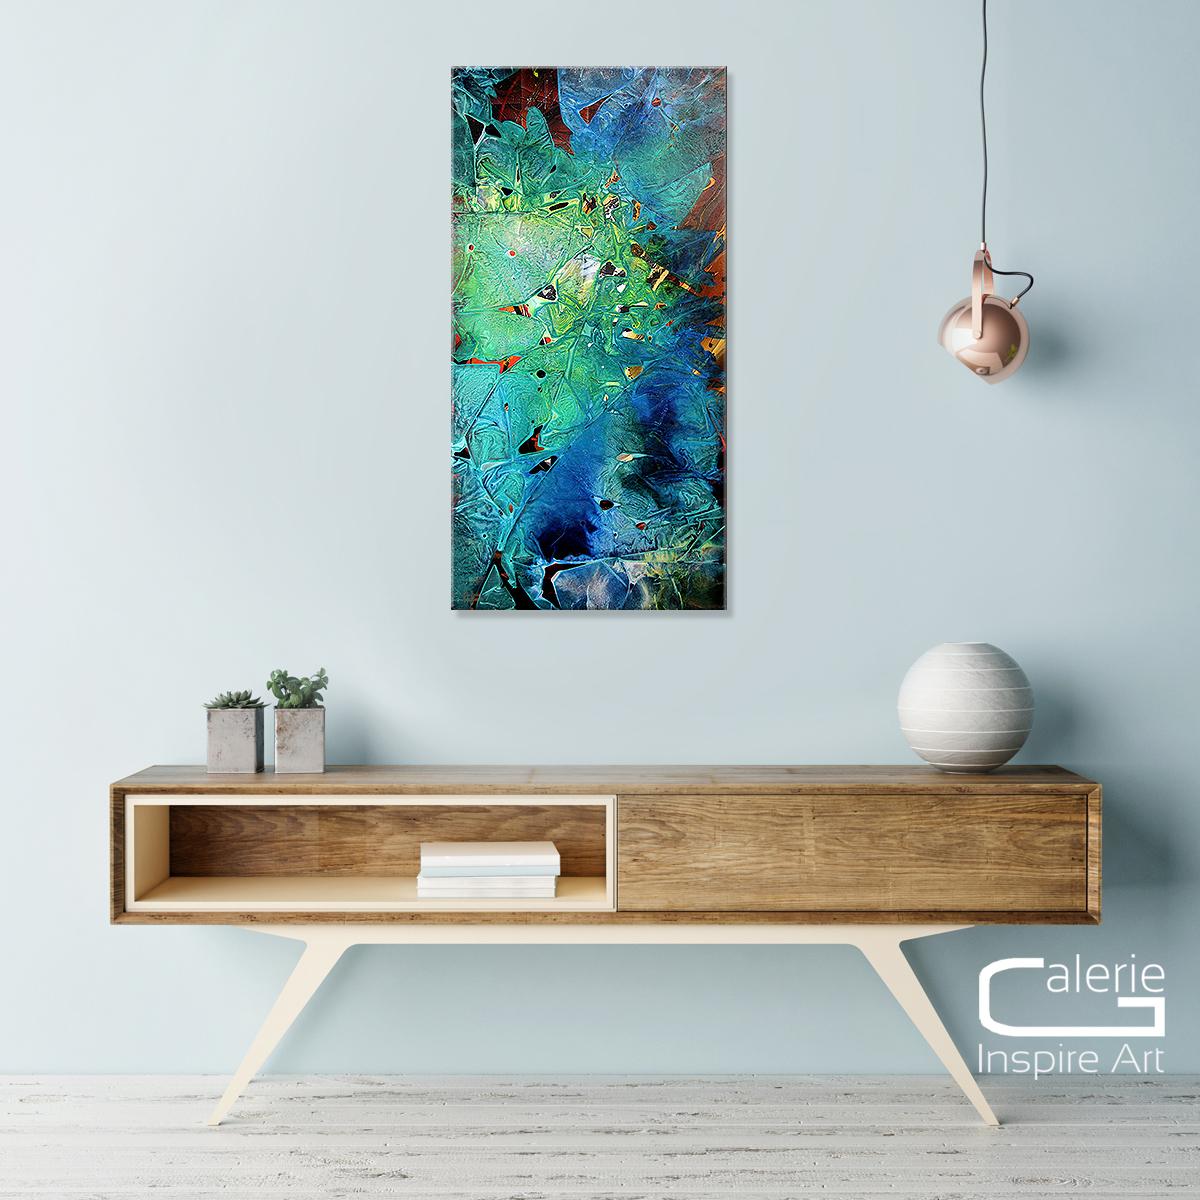 bilder online kaufen dieu second nature dieu k nstler galerie inspire art. Black Bedroom Furniture Sets. Home Design Ideas